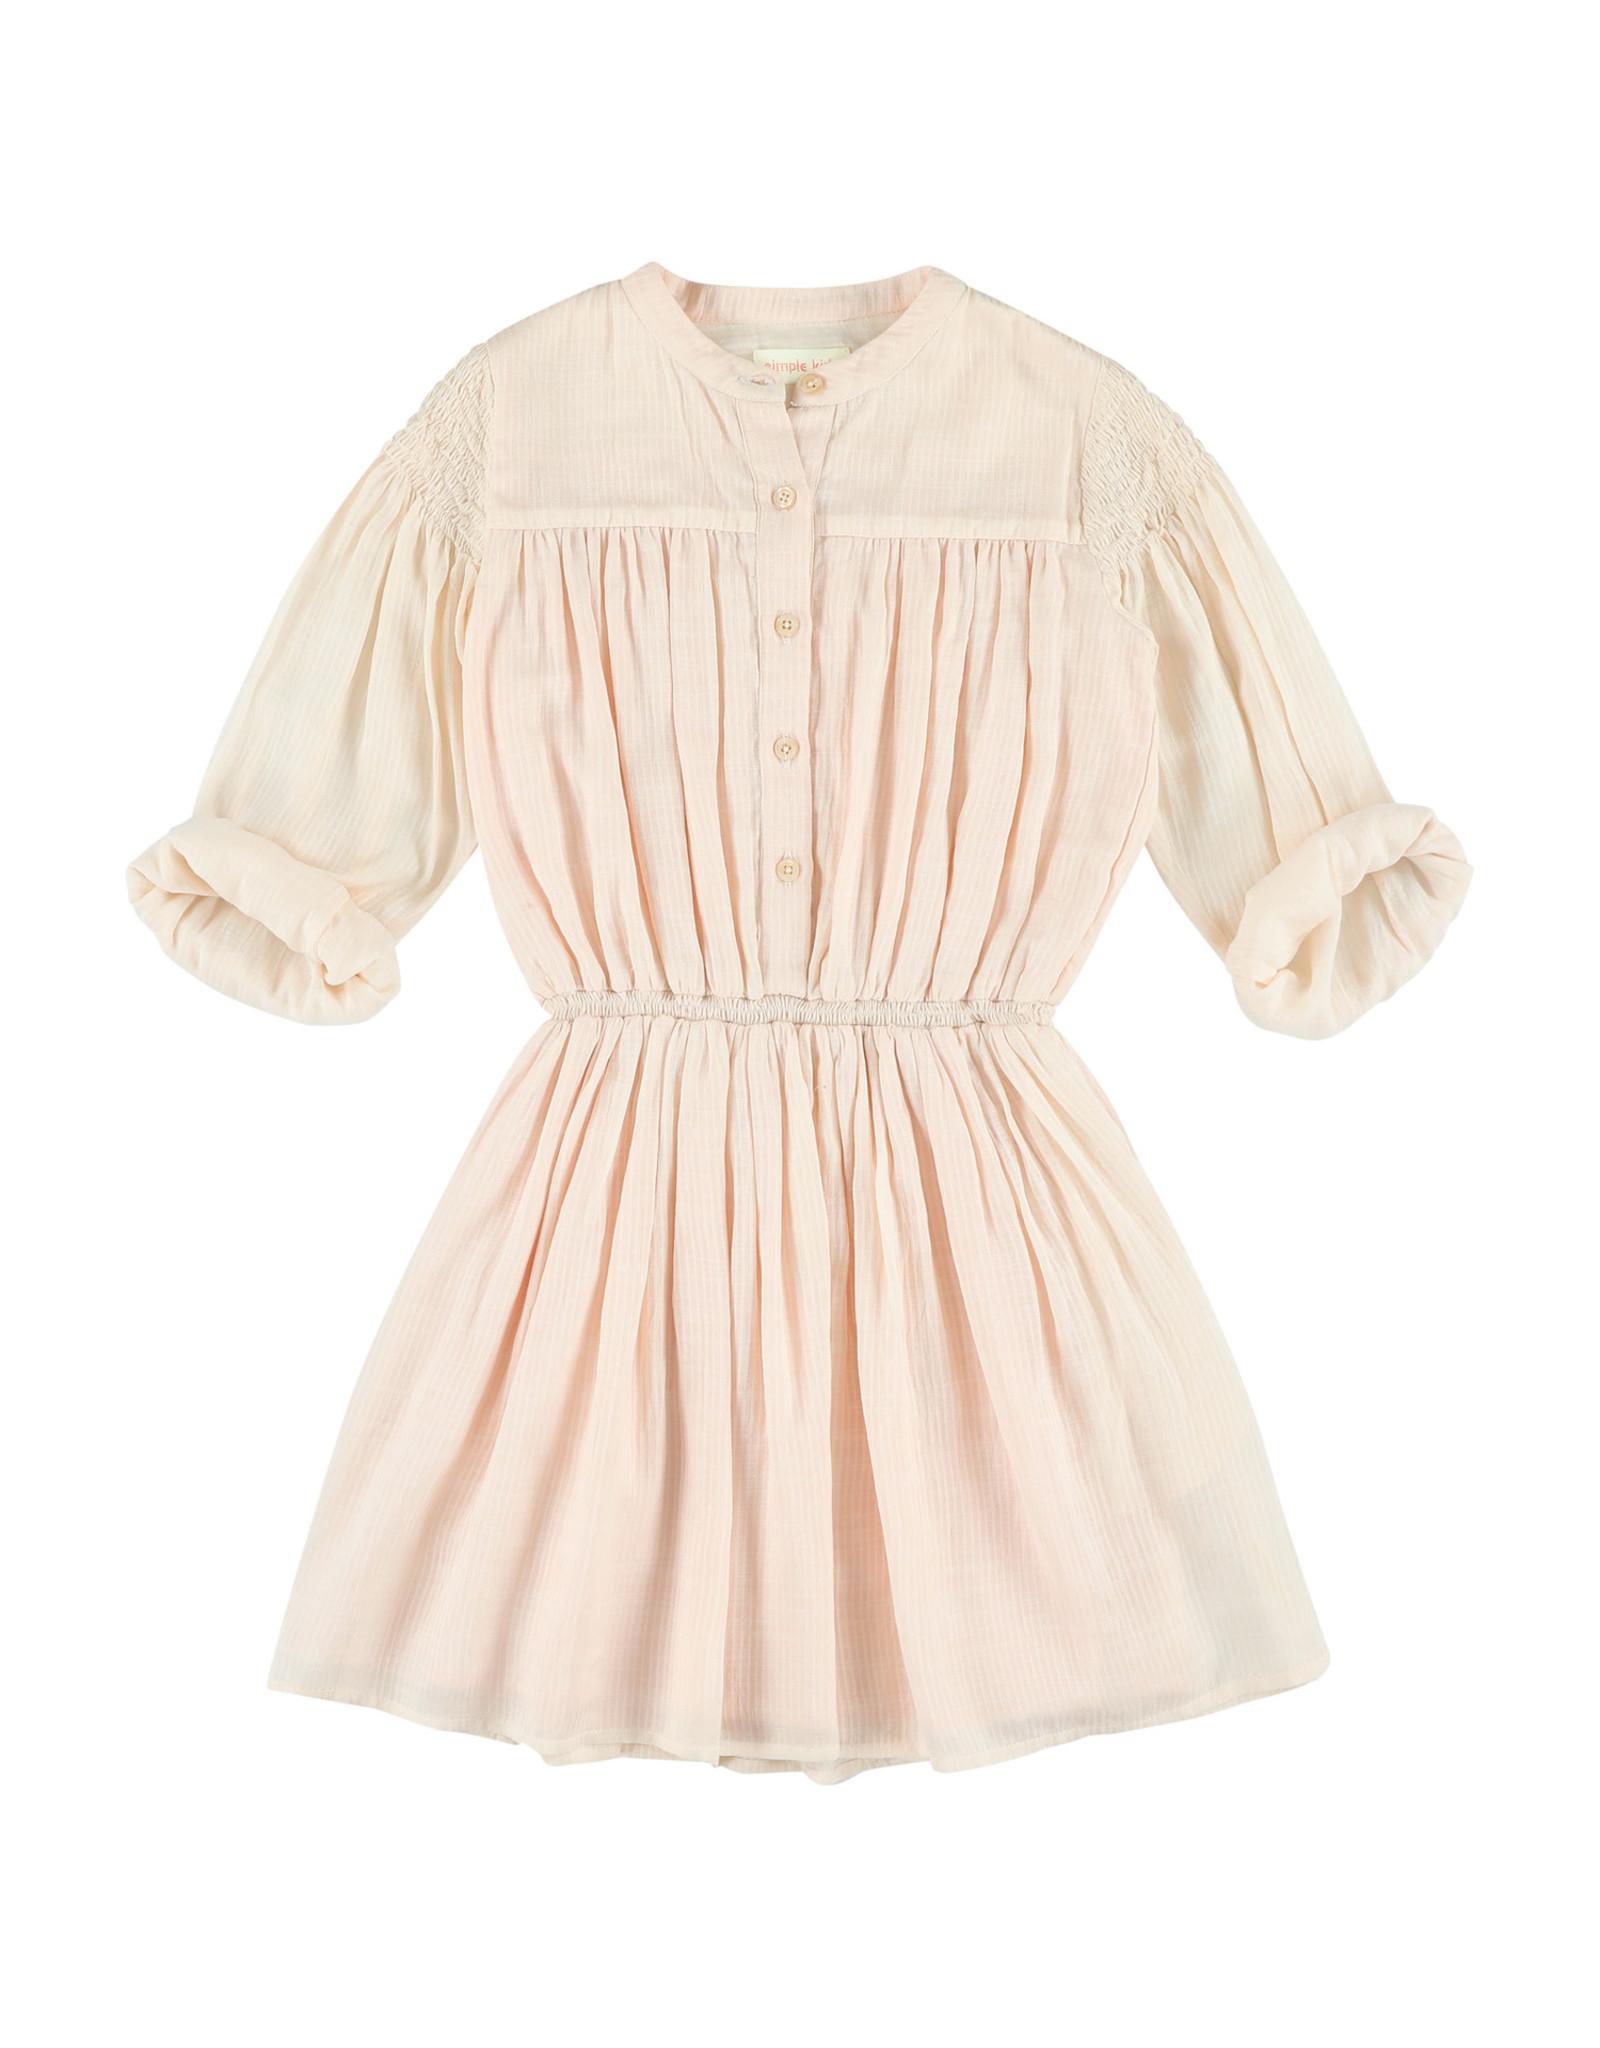 Simple Kids SS21 Ant Modrib rose dress